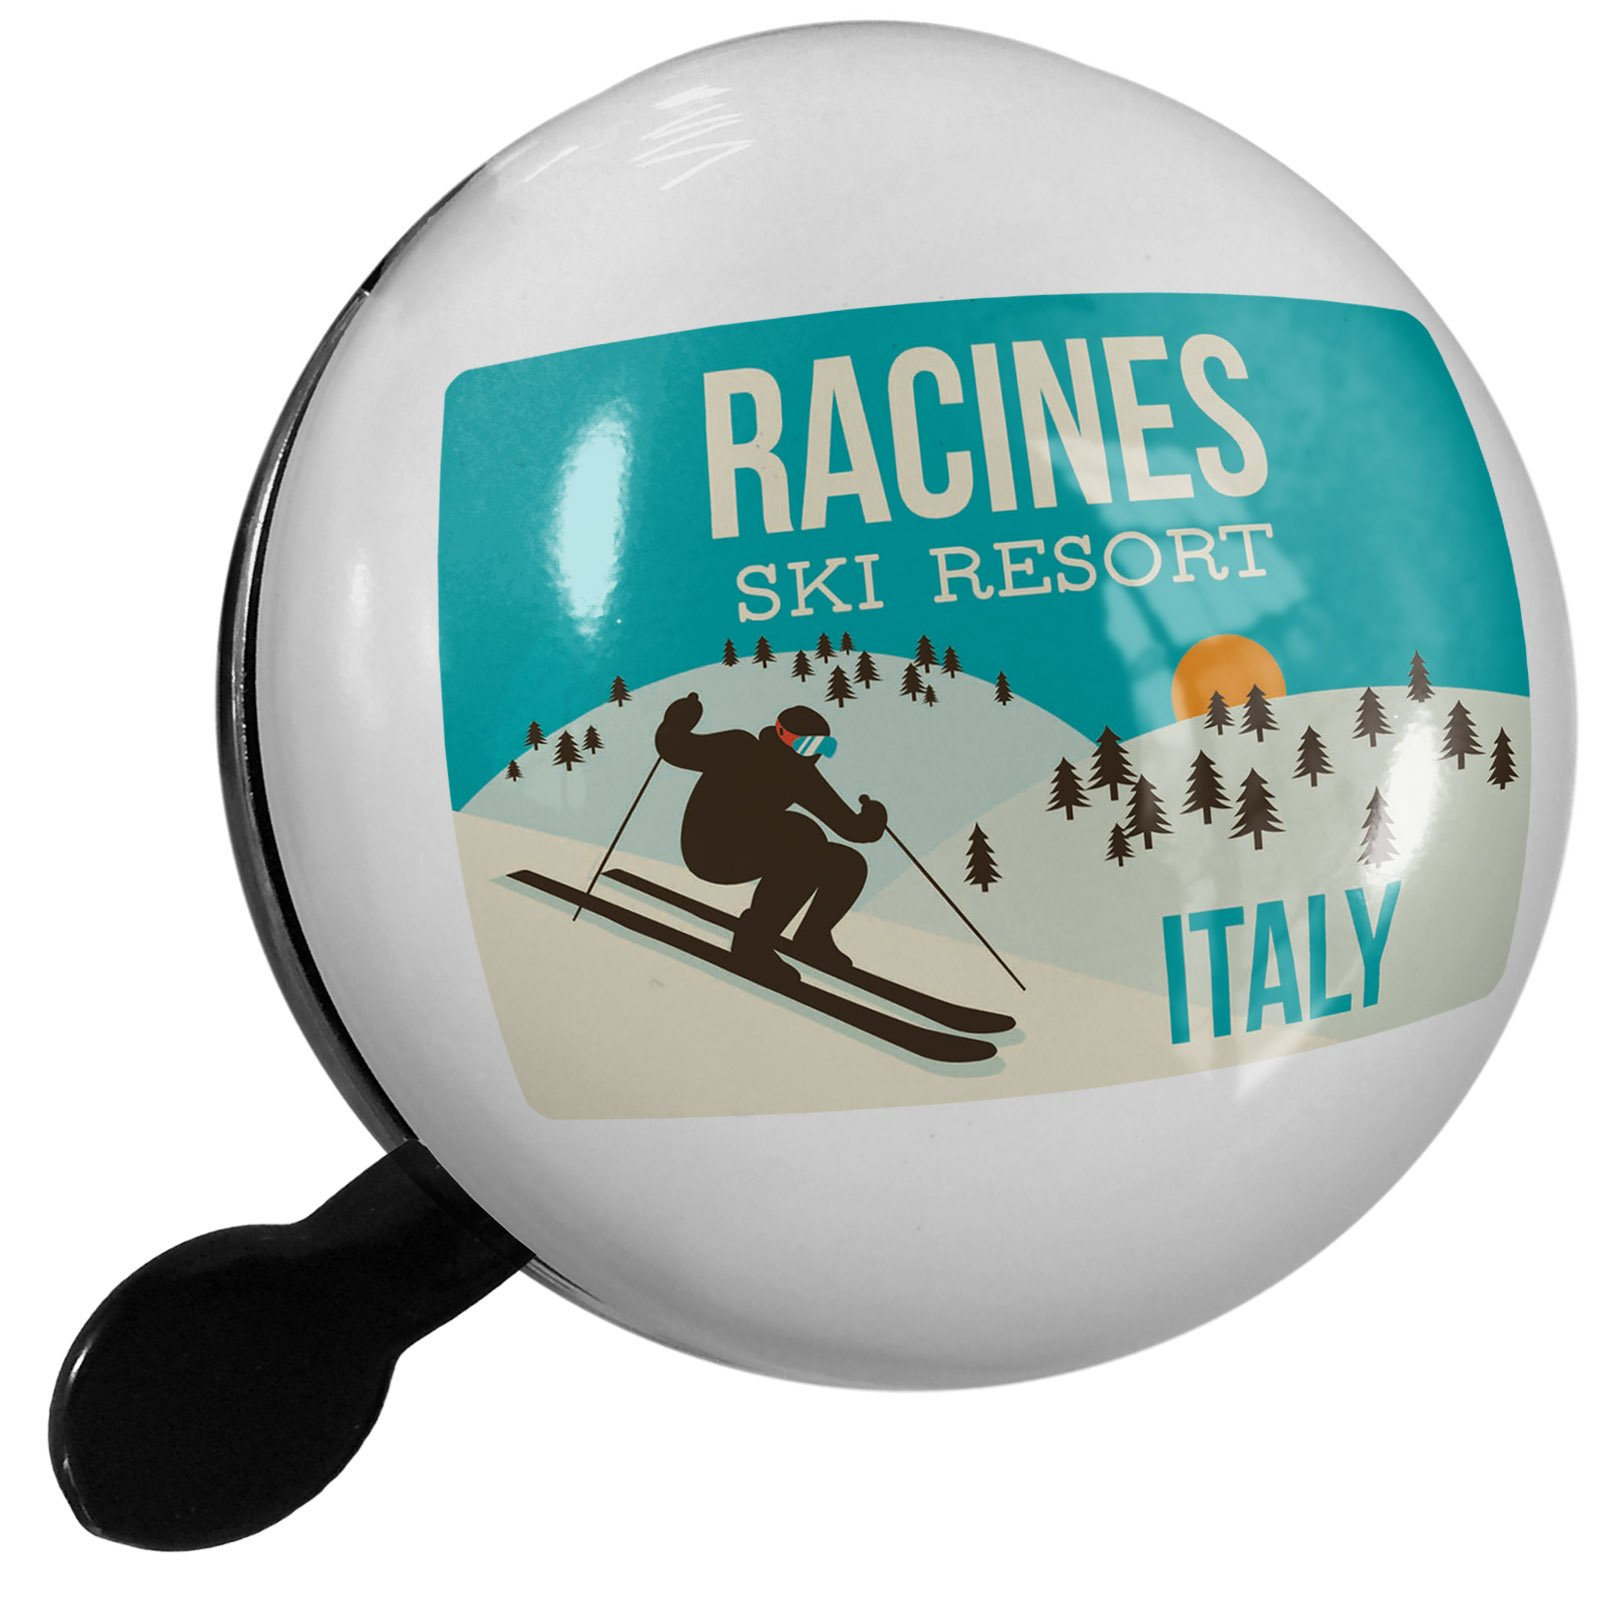 Small Bike Bell Racines Ski Resort - Italy Ski Resort - NEONBLOND